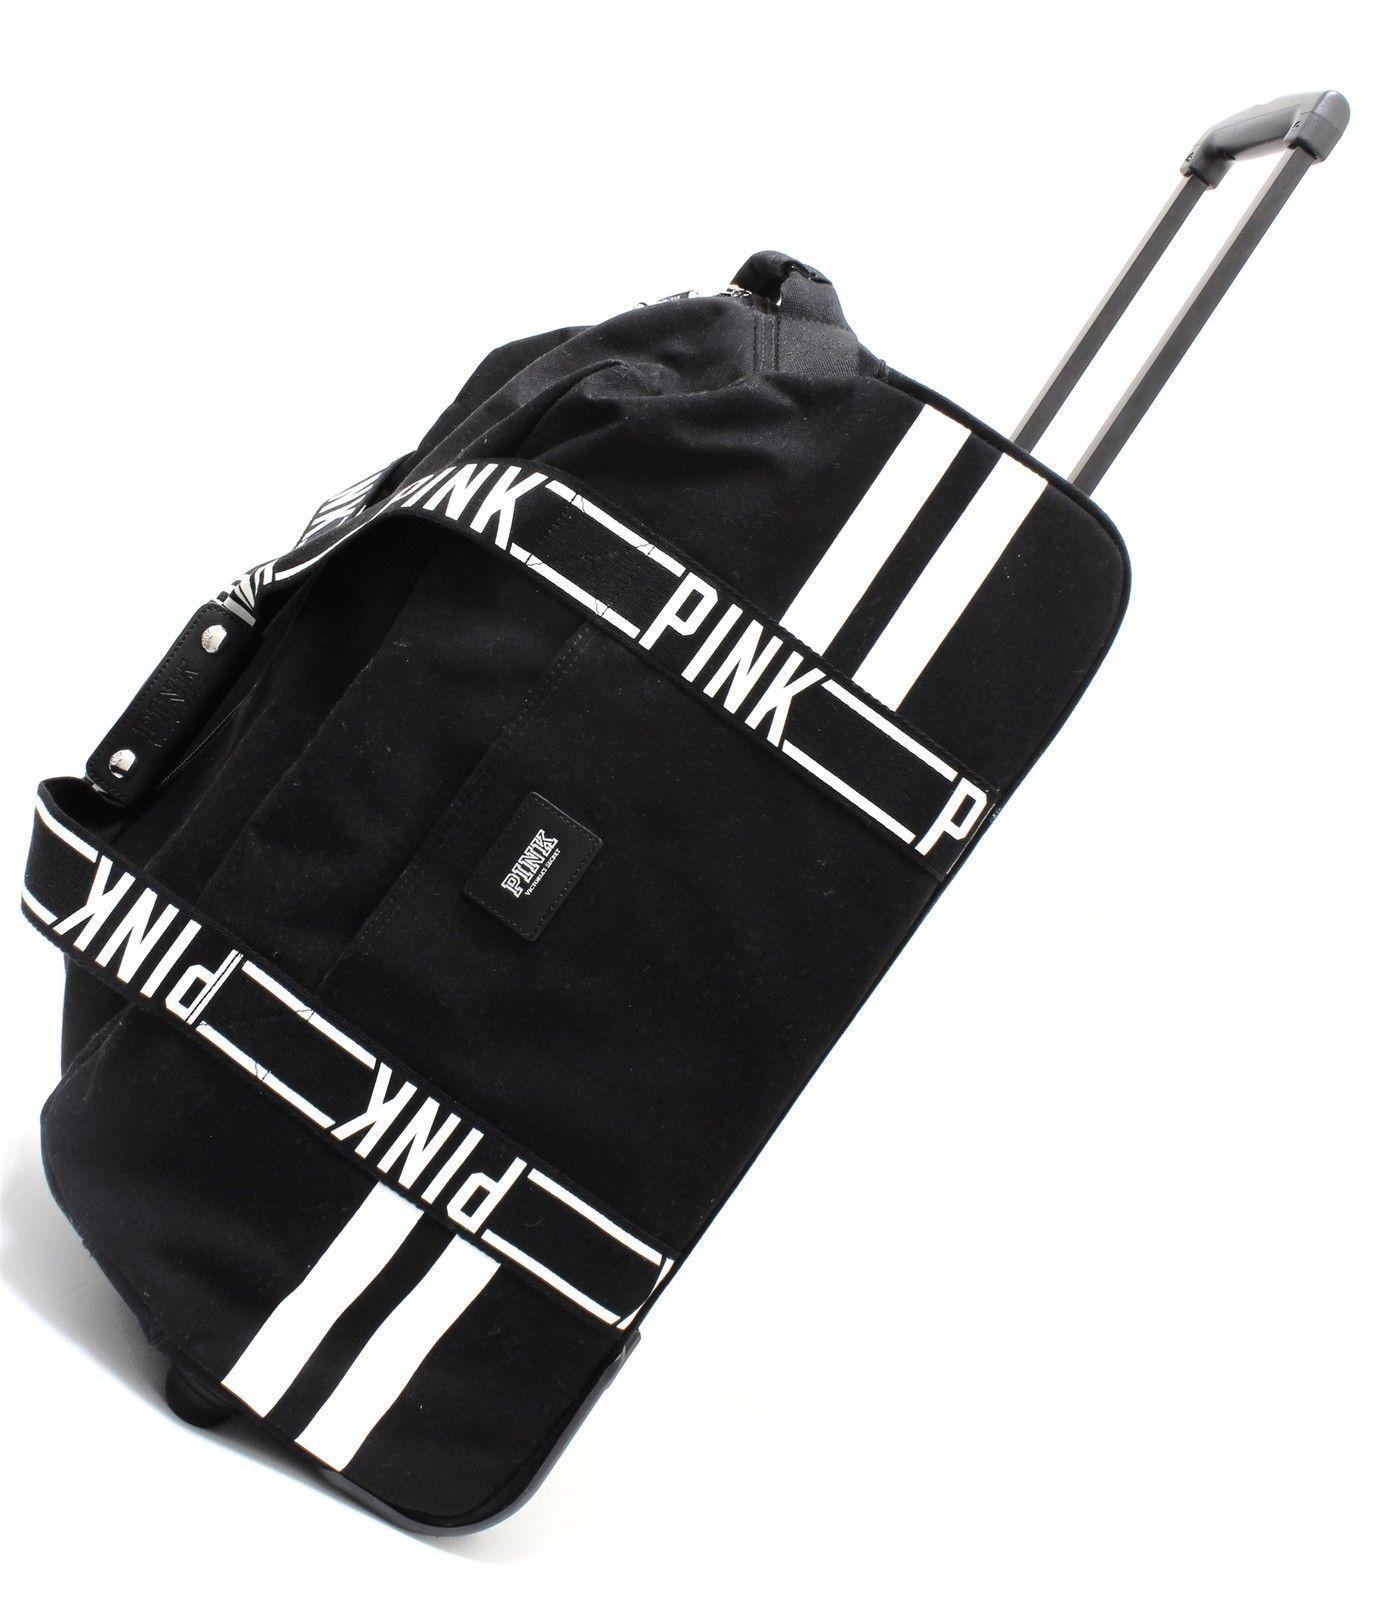 victoria secret luggage bag luggage bag travel luggage bags on sale